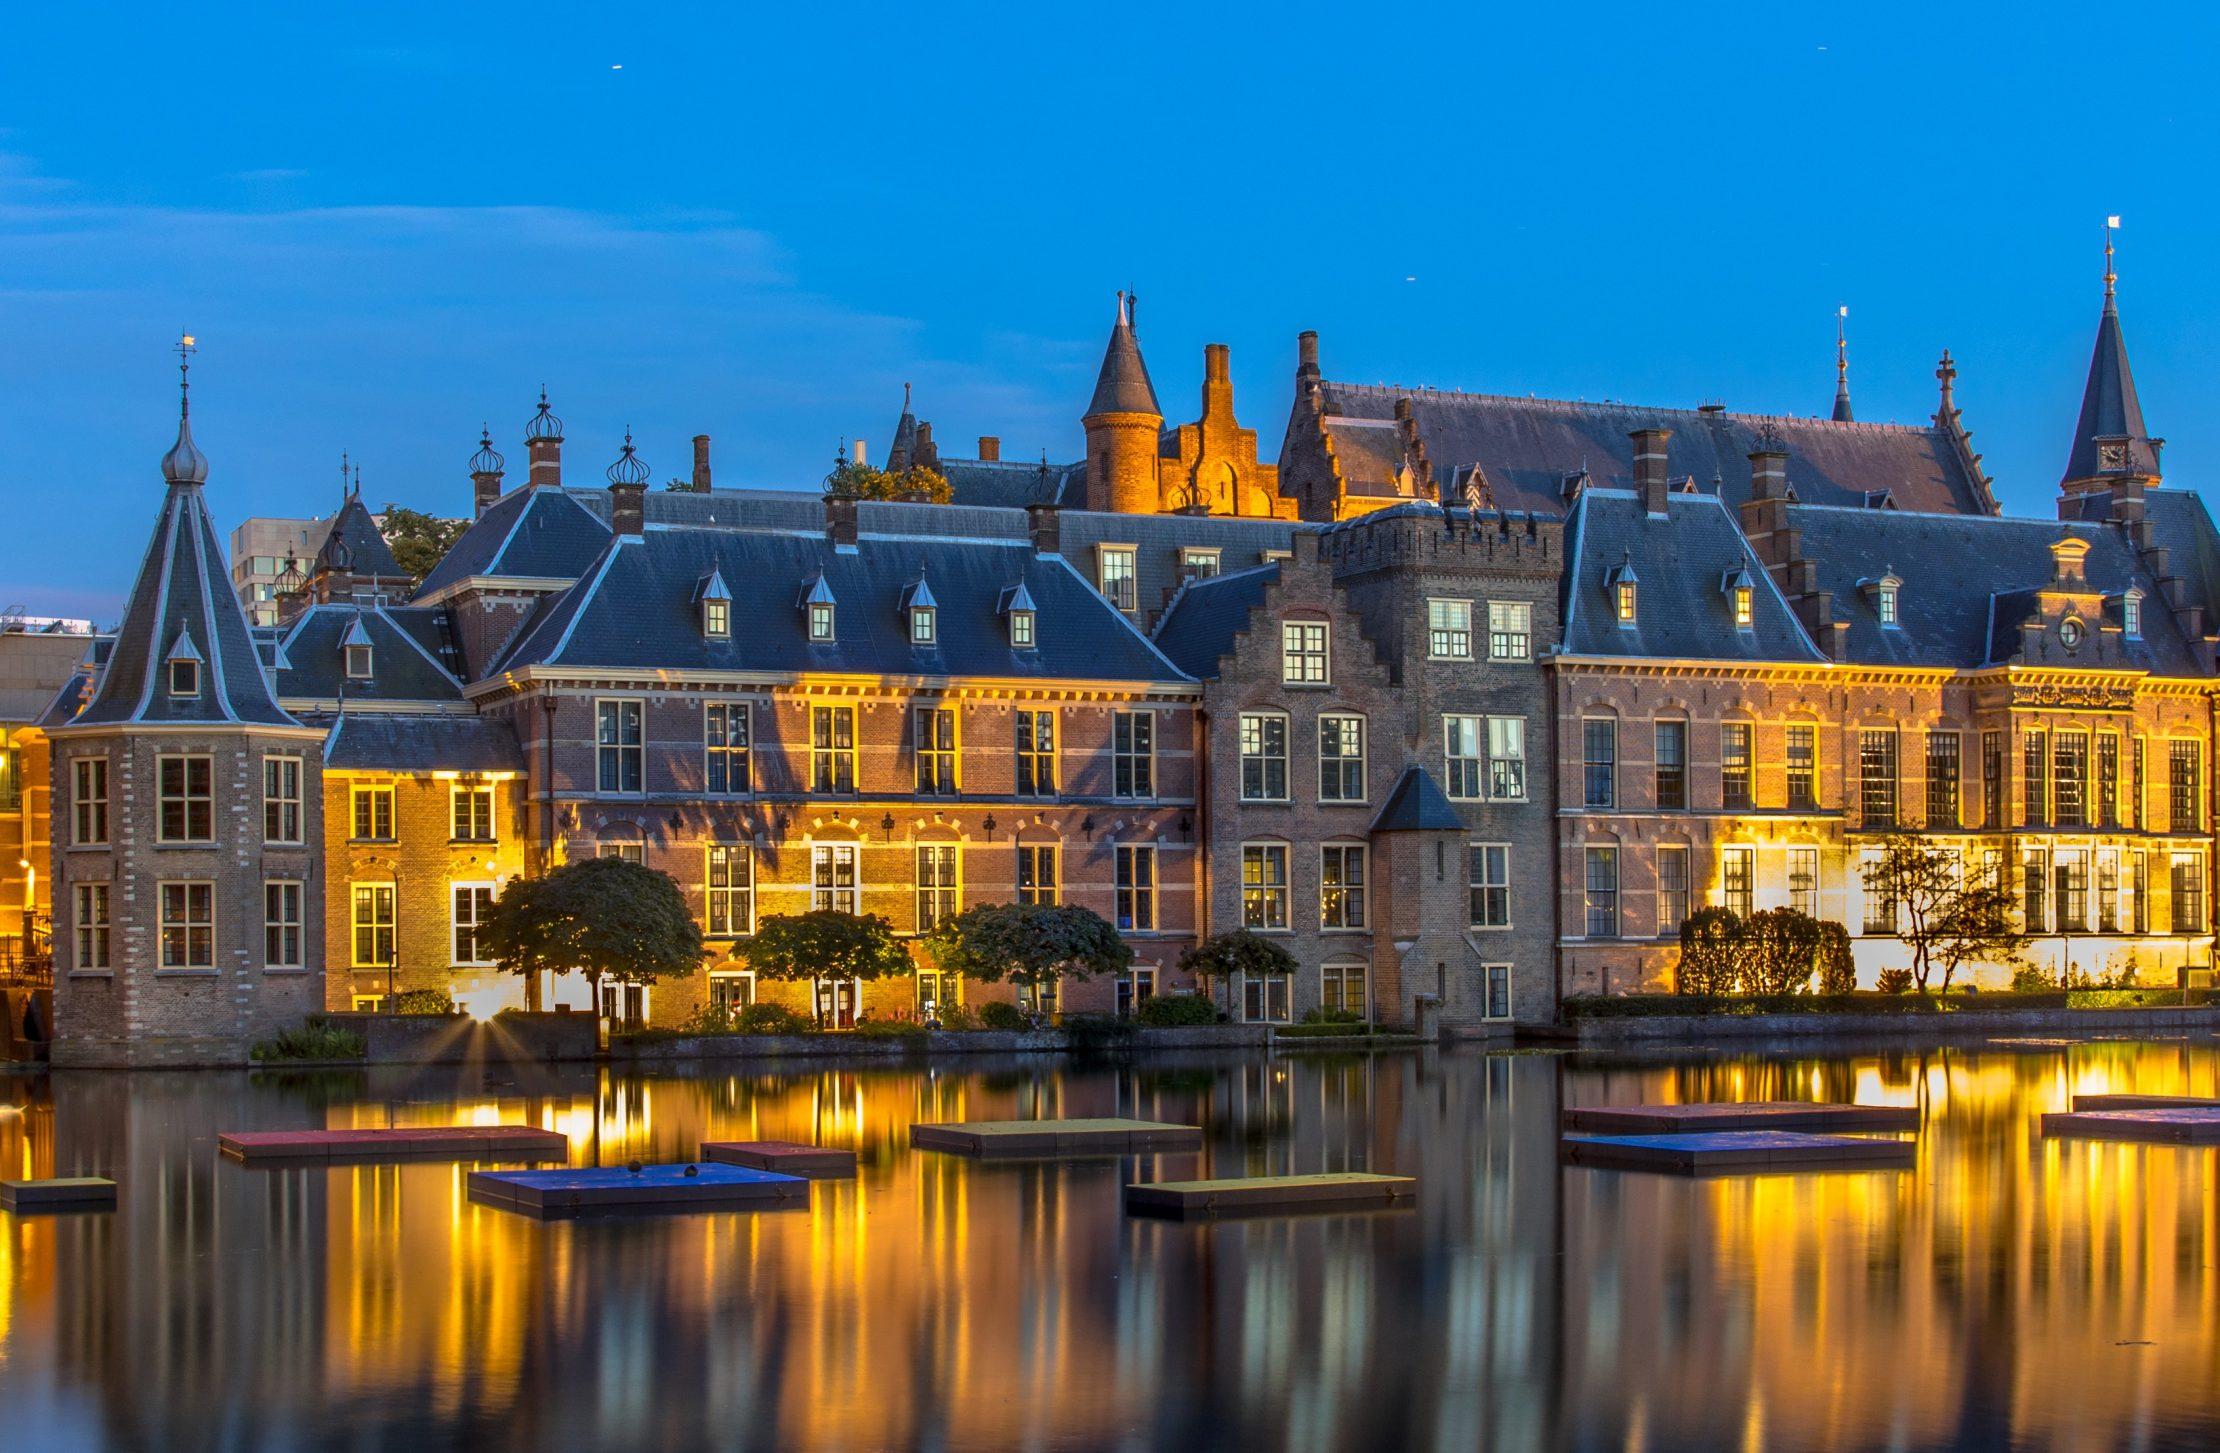 Dutch parliament building Binnenhof in The Hague